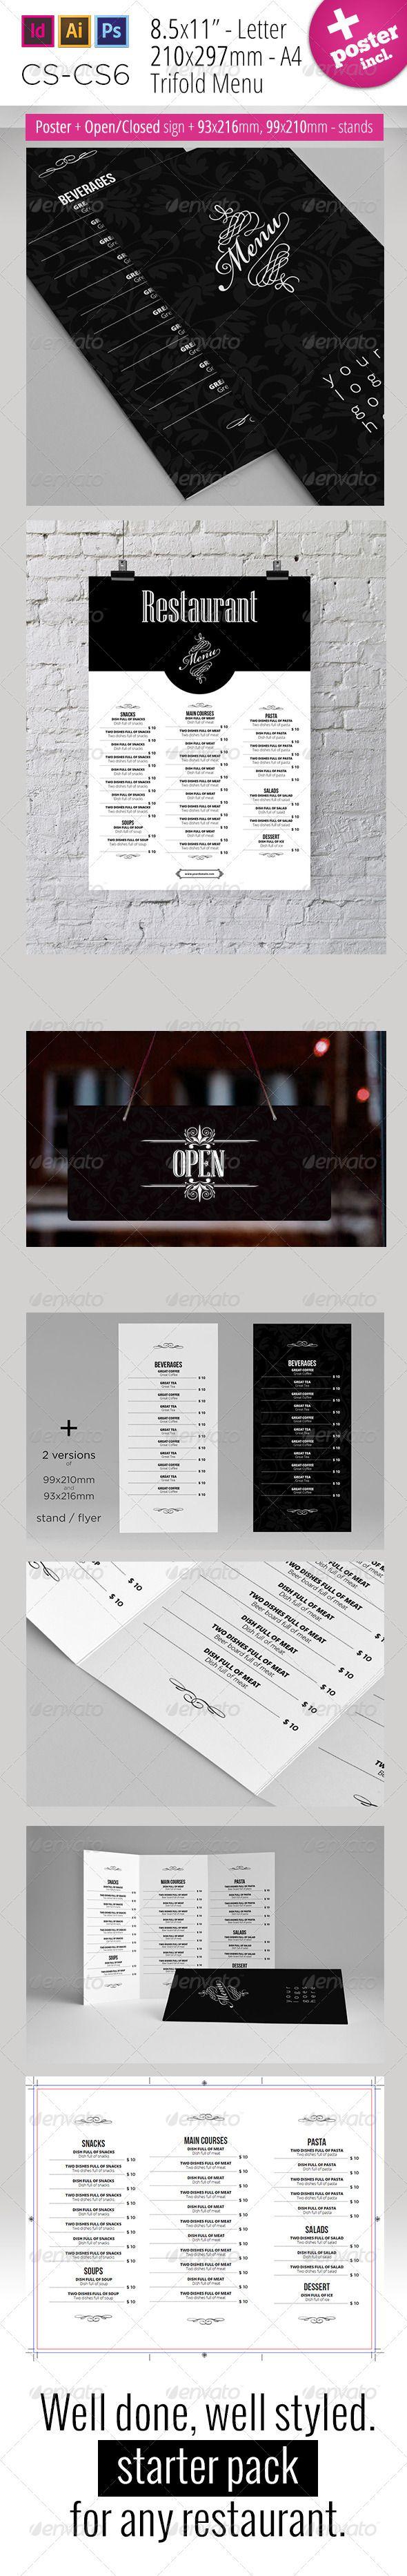 46 best restaurant menu images on pinterest restaurant menu design